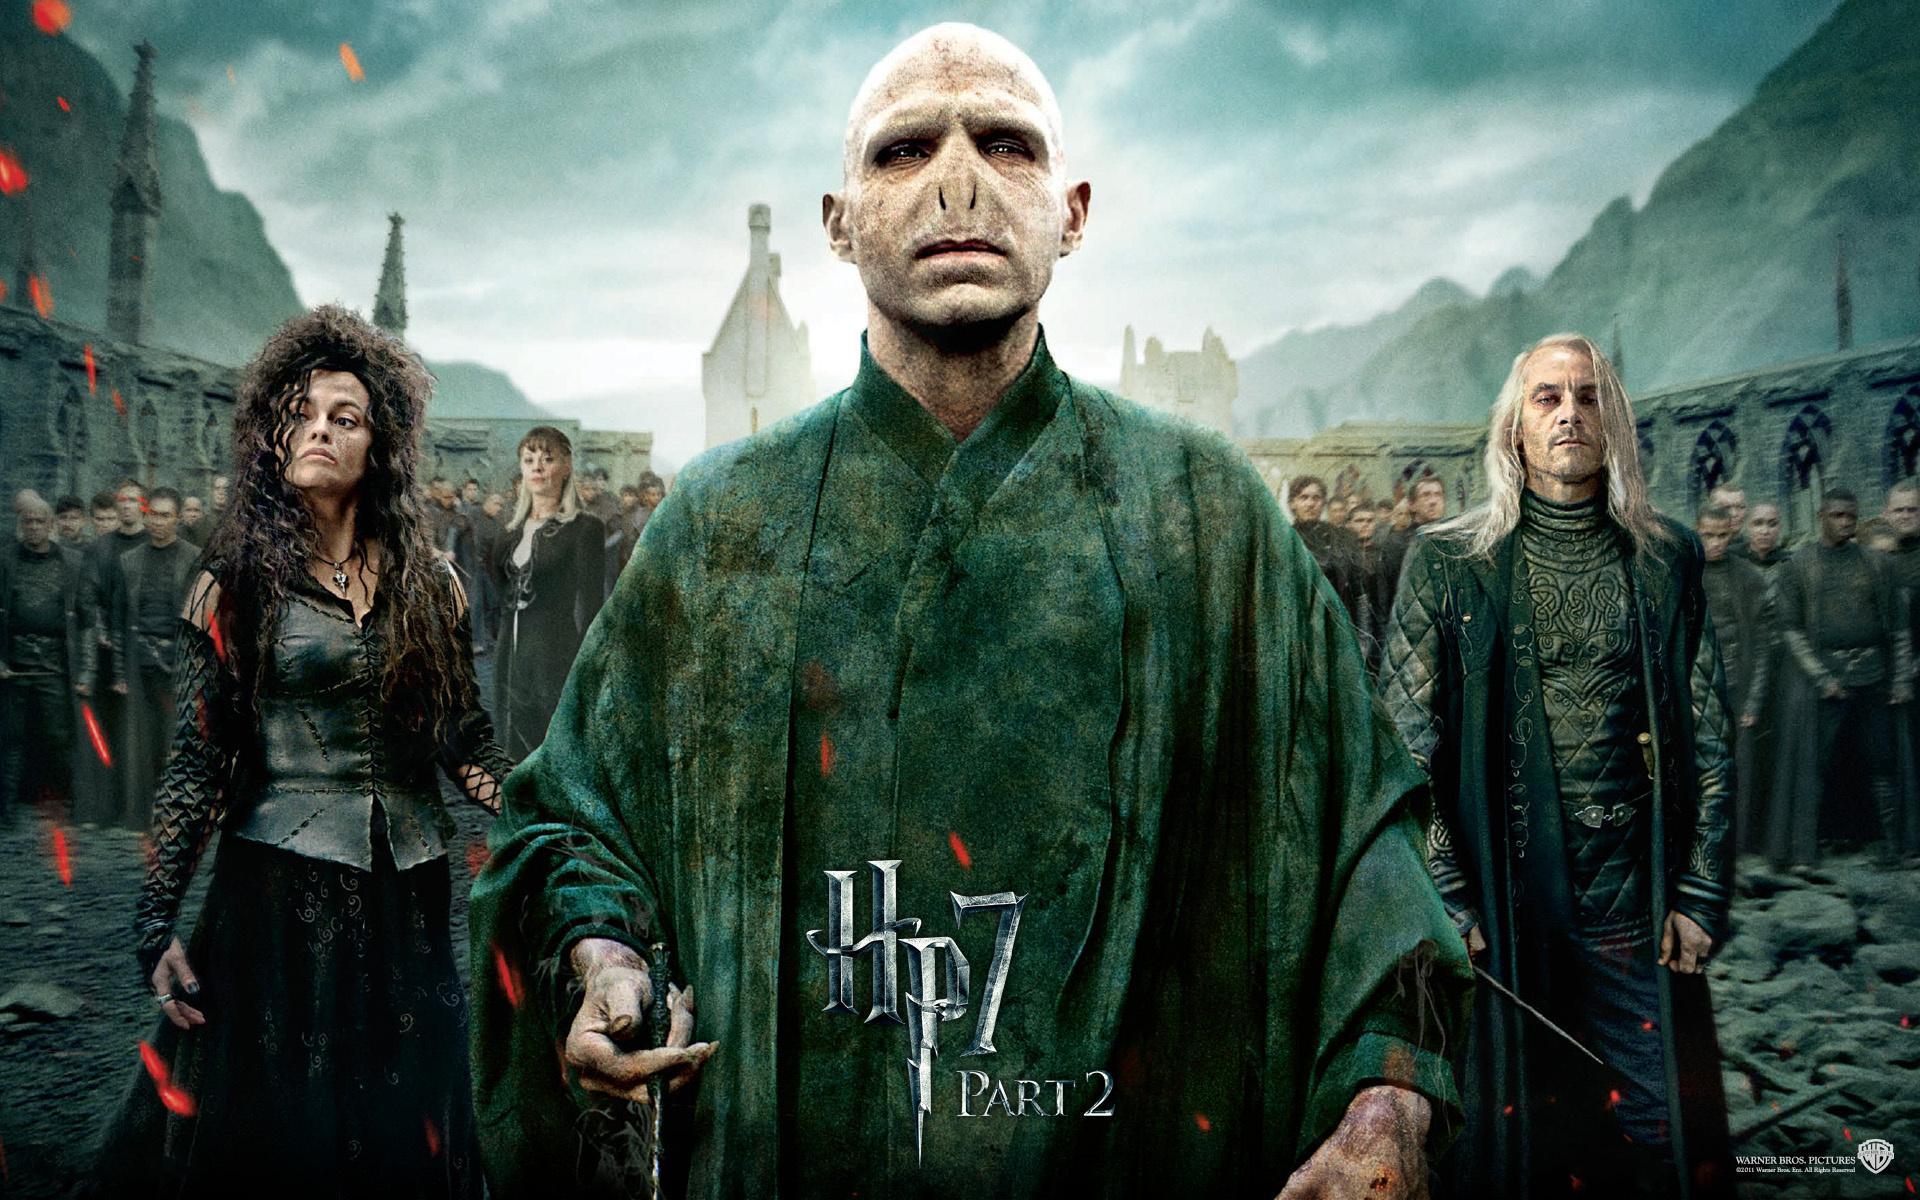 Beautiful Wallpaper Harry Potter Deathly Hallows - 257612-Sepik  Trends_39368.jpg